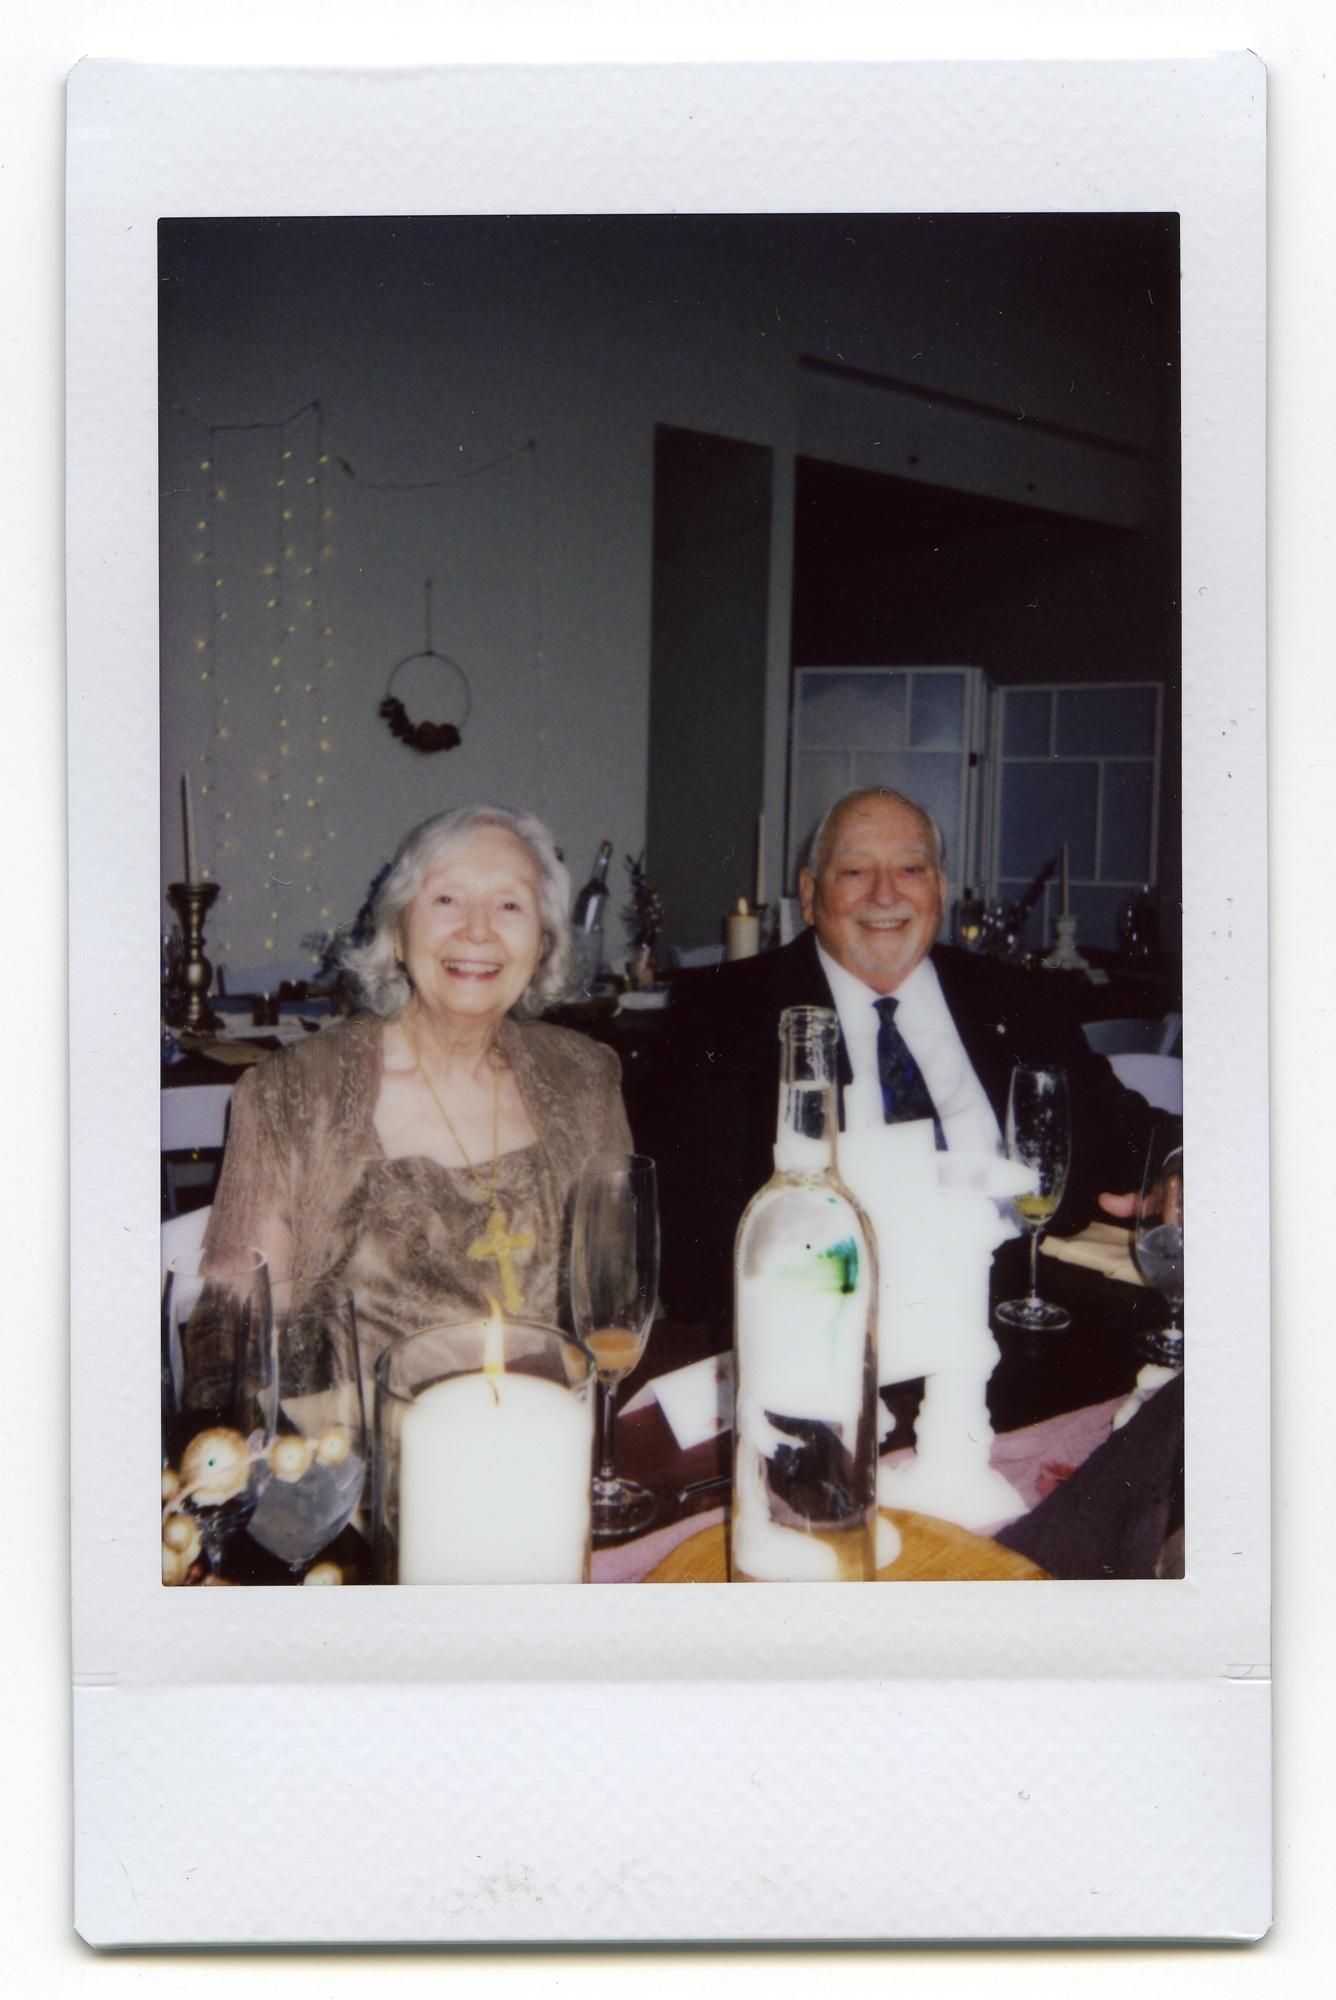 Instax wedding photos